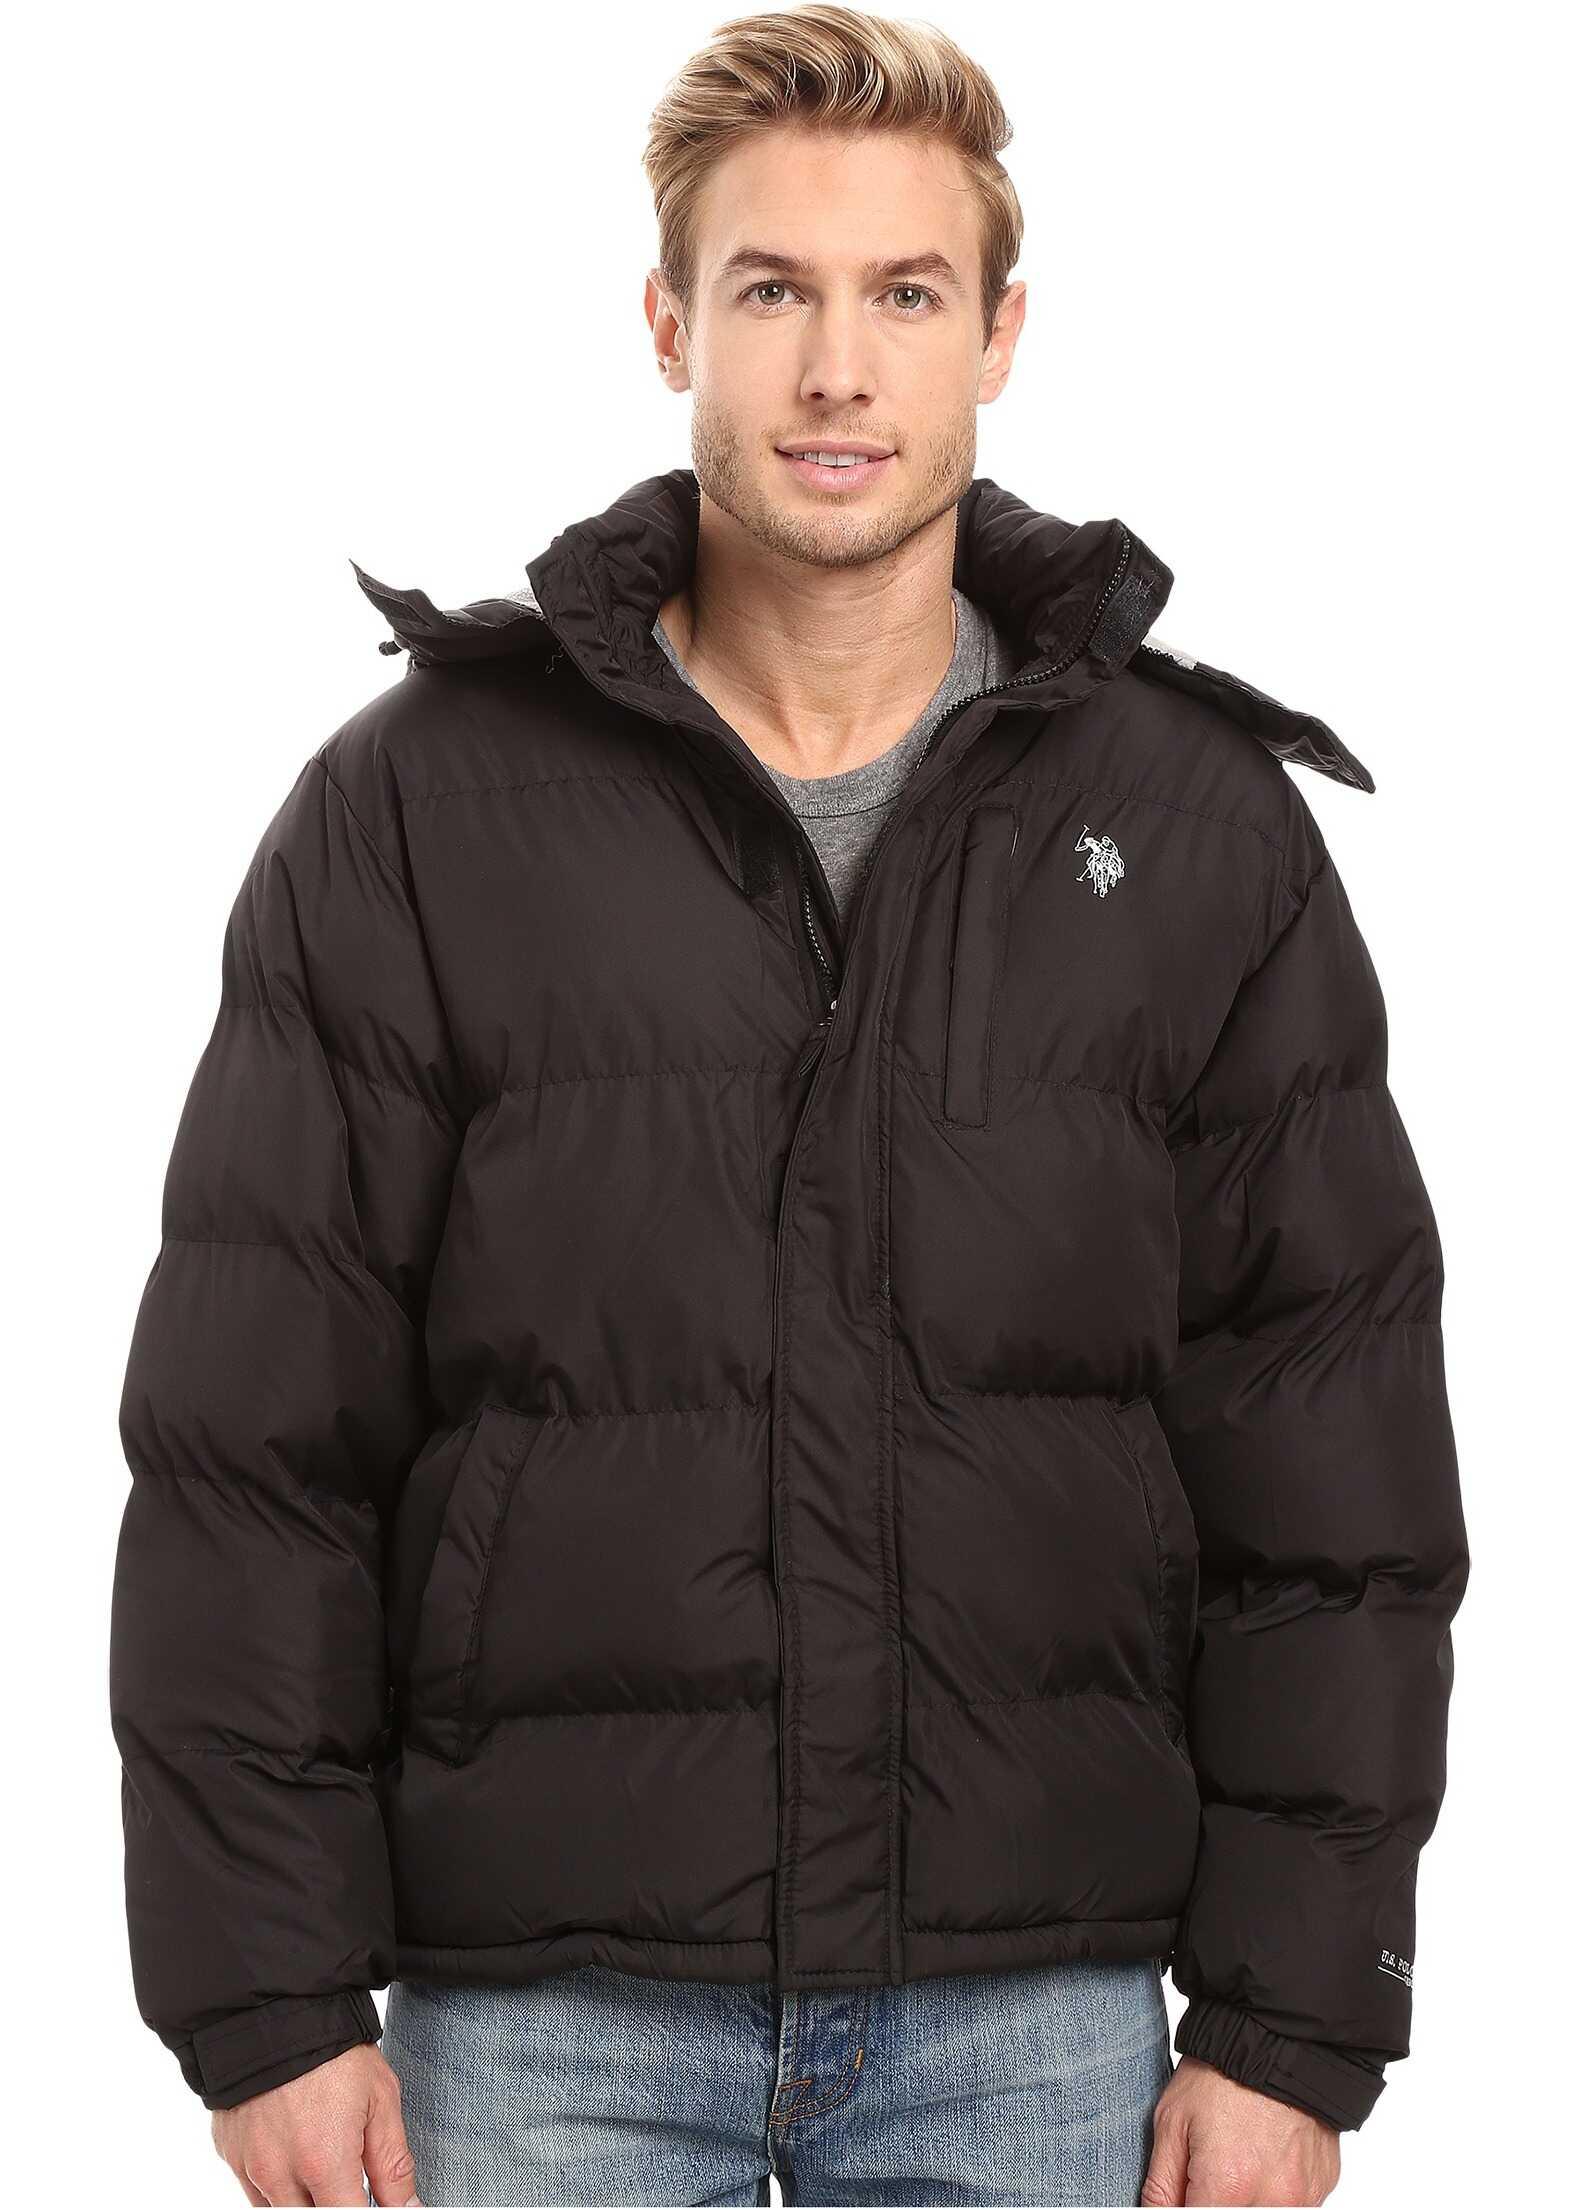 U.S. POLO ASSN. Classic Short Bubble Jacket Black